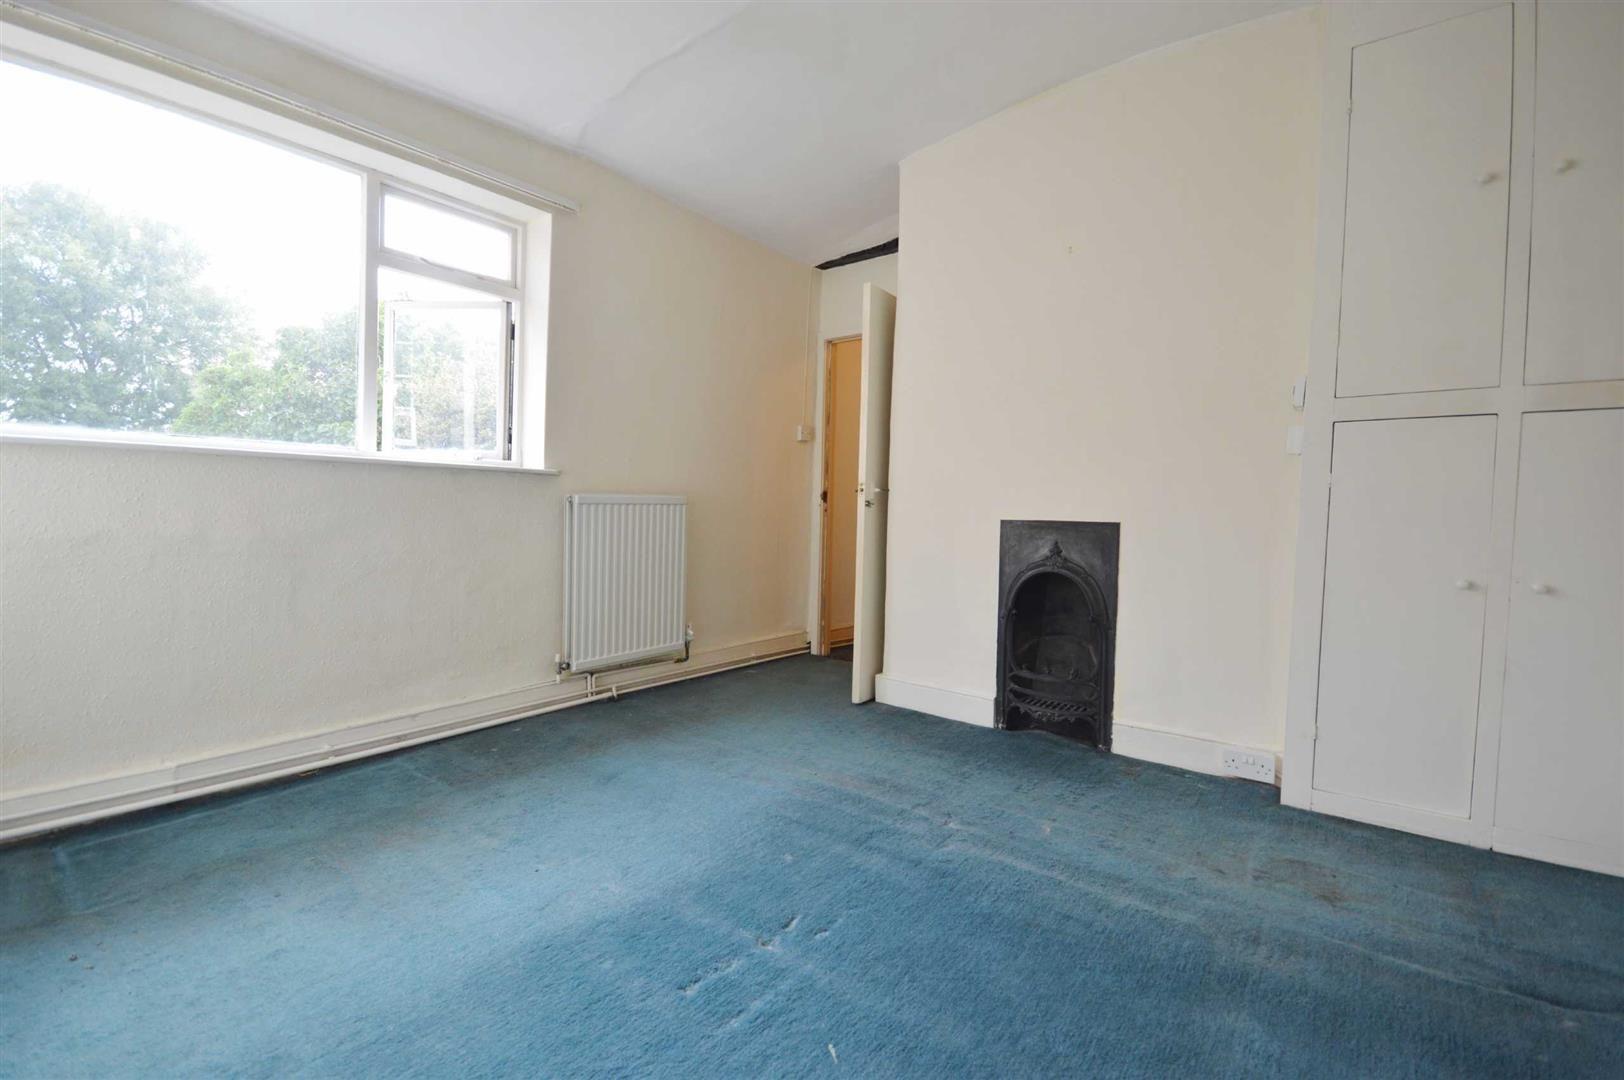 3 bed cottage for sale in Leominster  - Property Image 6